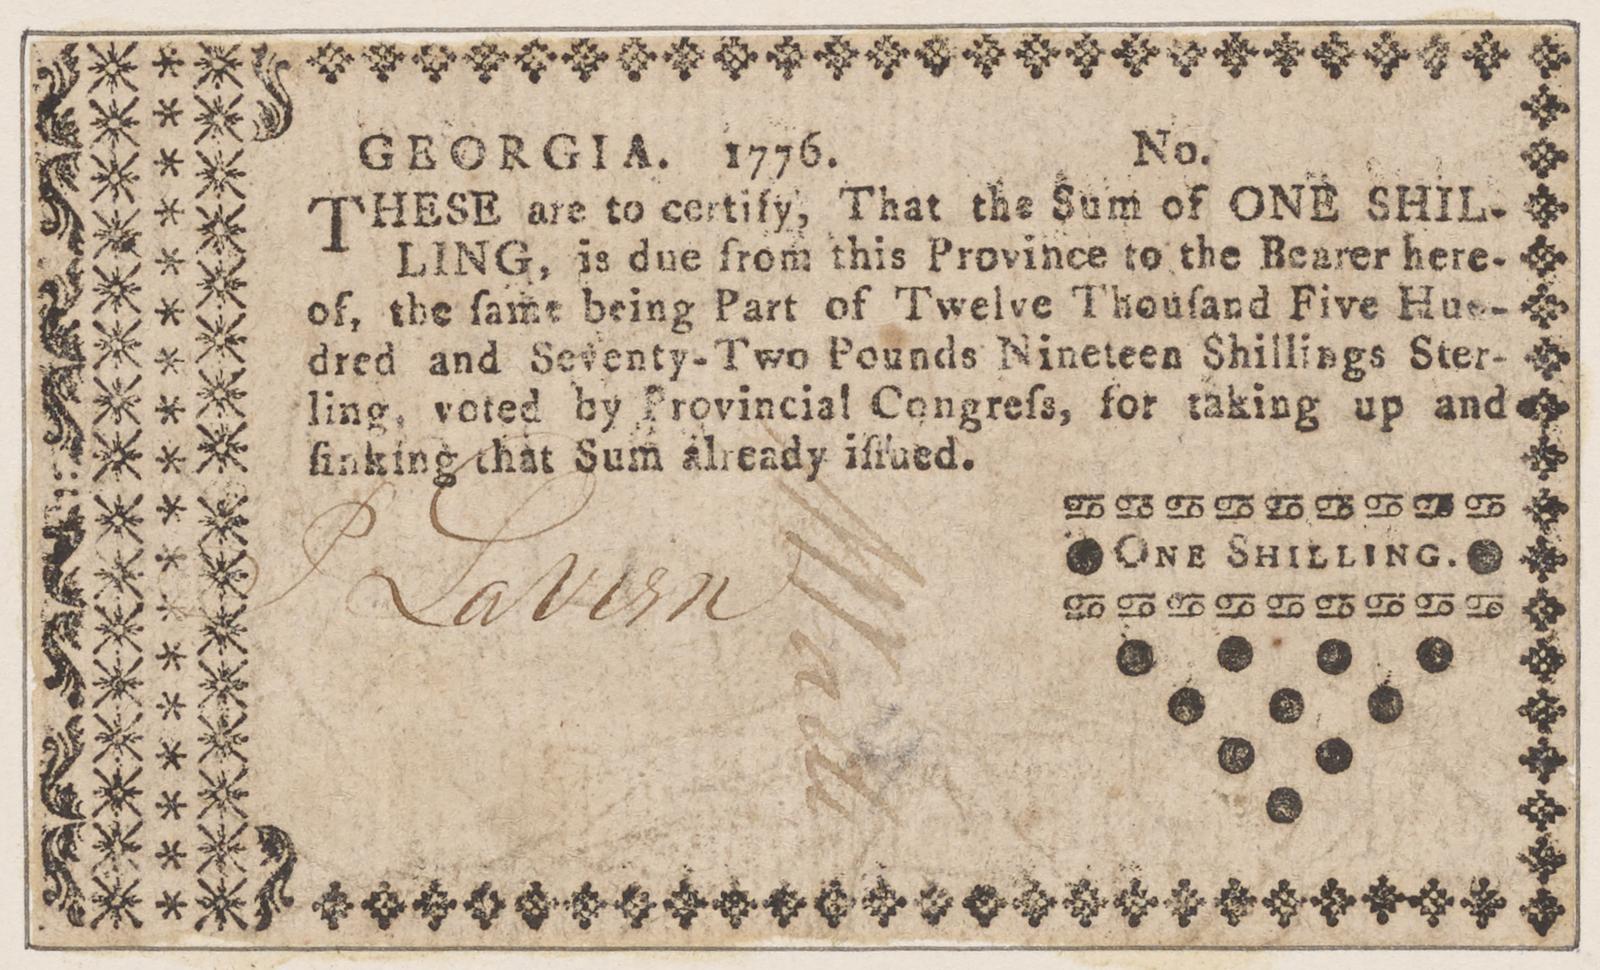 Georgia paper money. One shilling